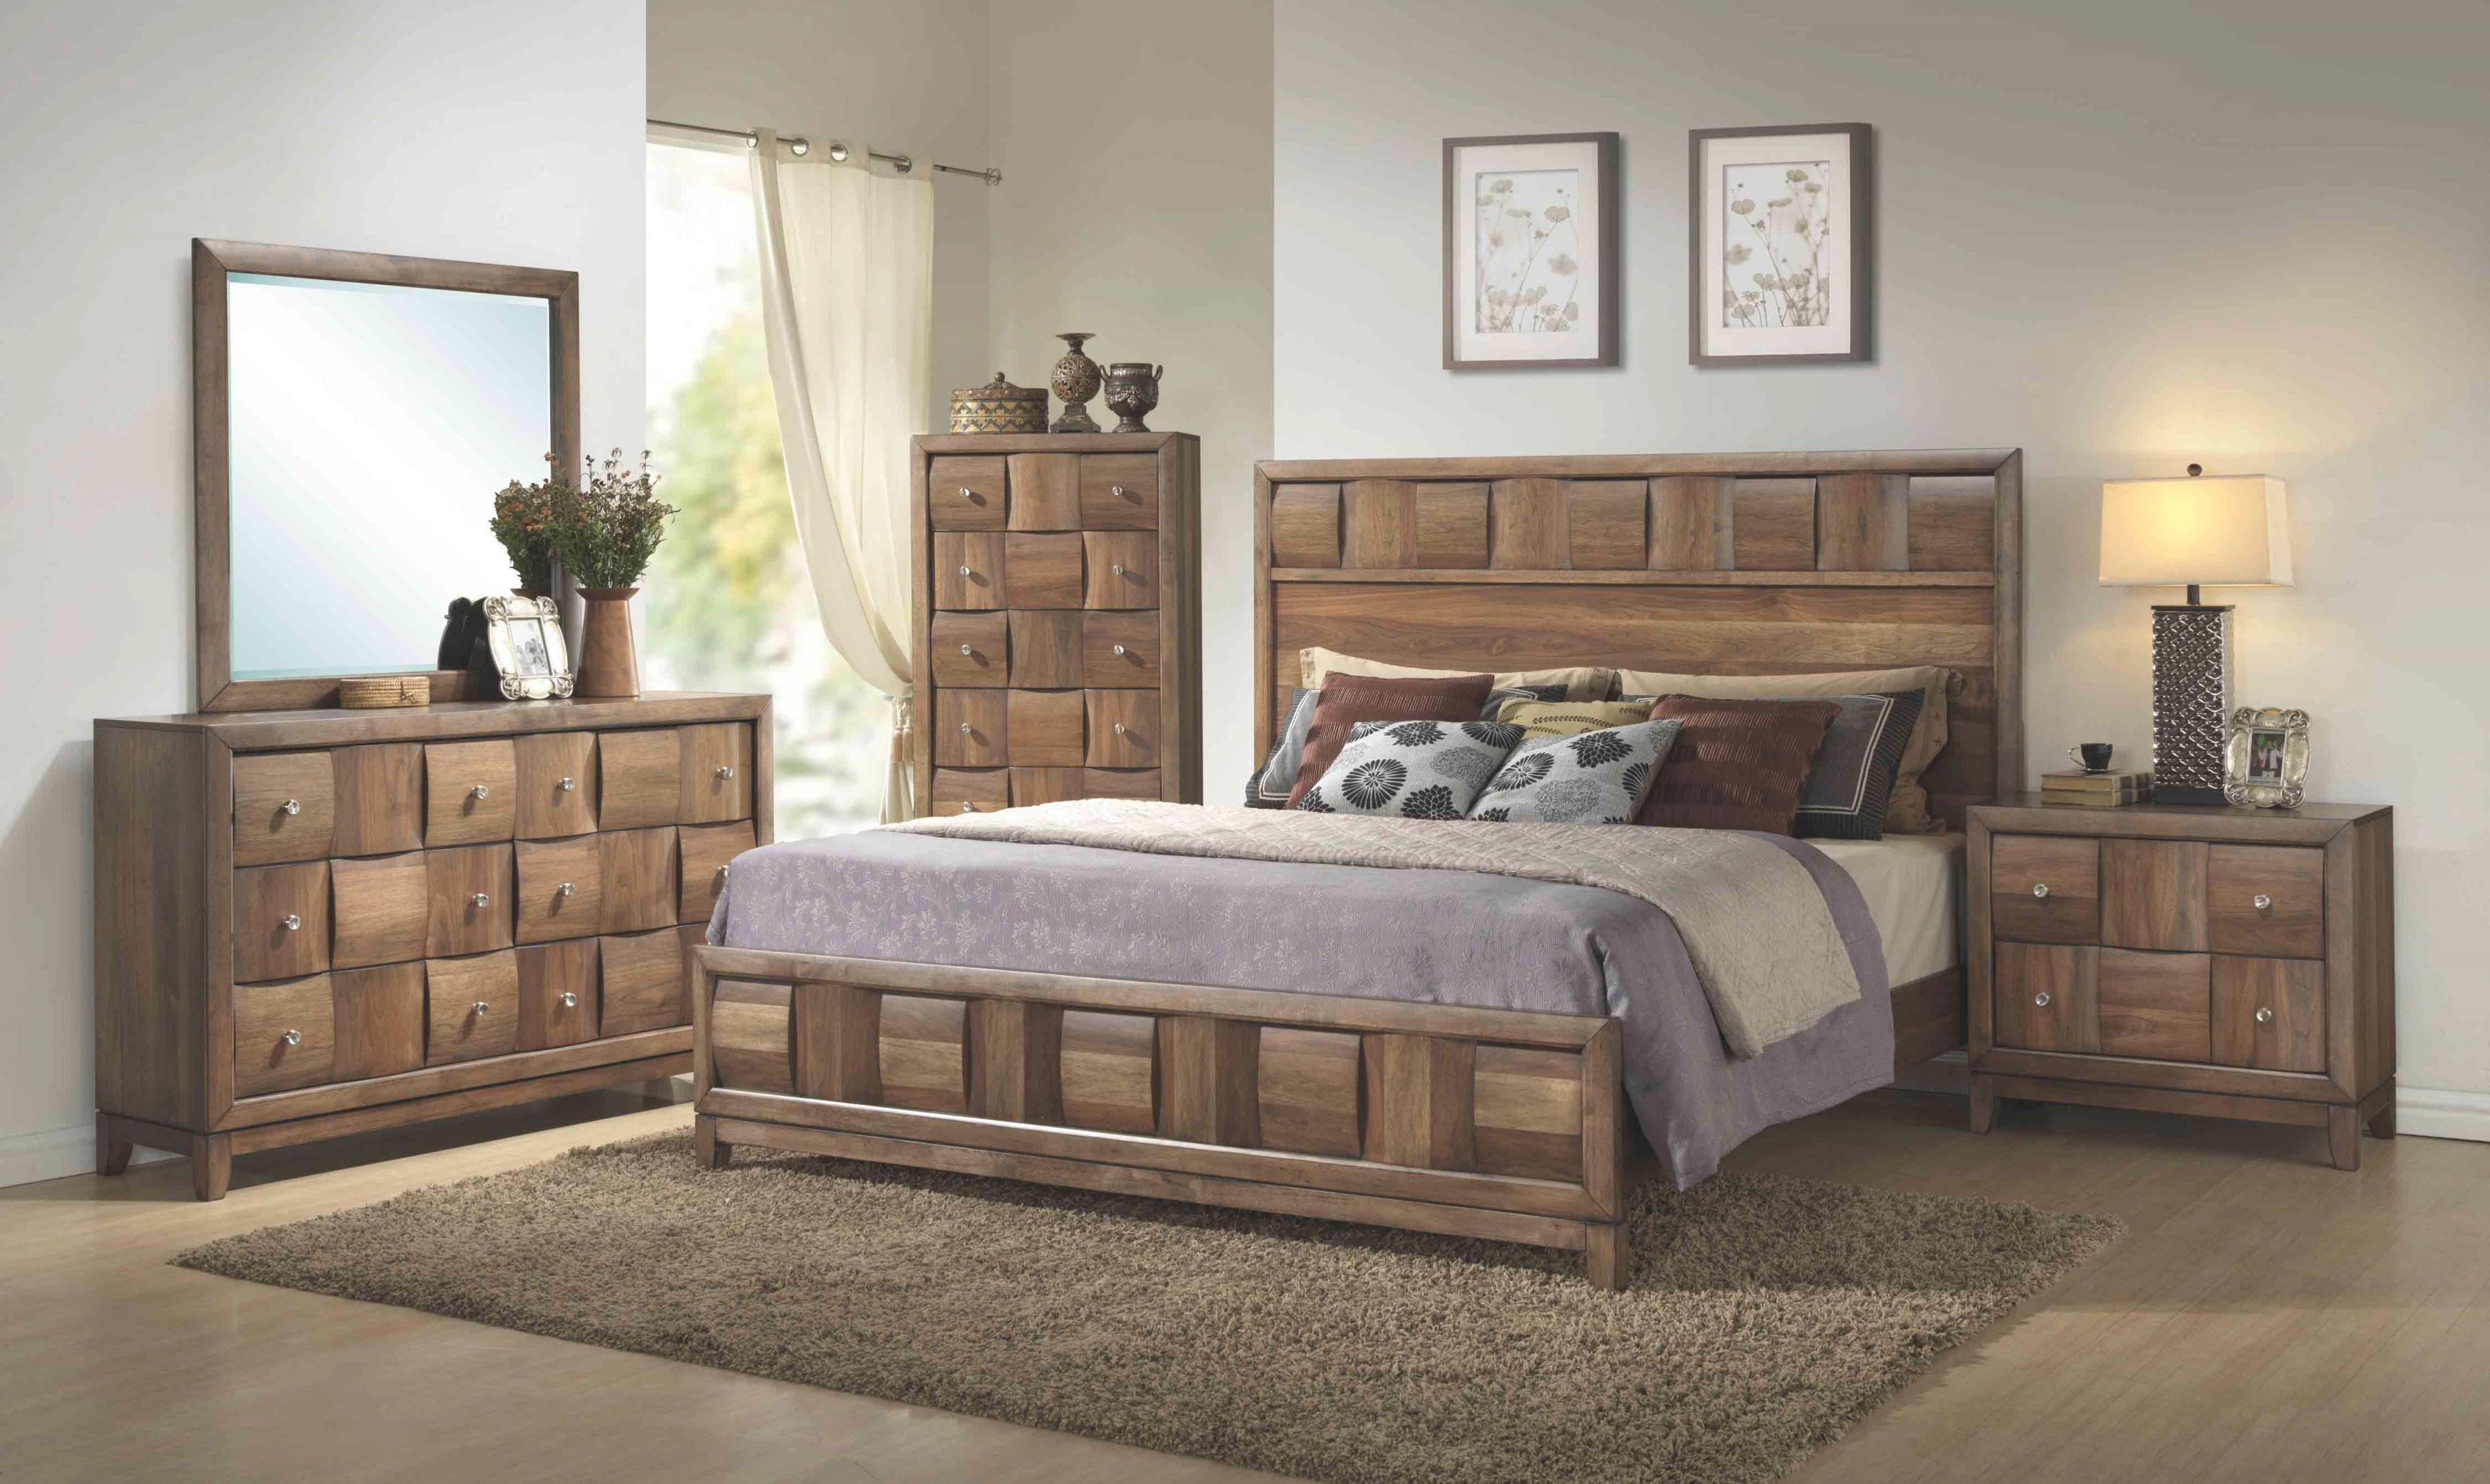 Bedroom : Solid Oak Furniture Contemporary Home Ideas inside Fresh Bedroom Set Ideas